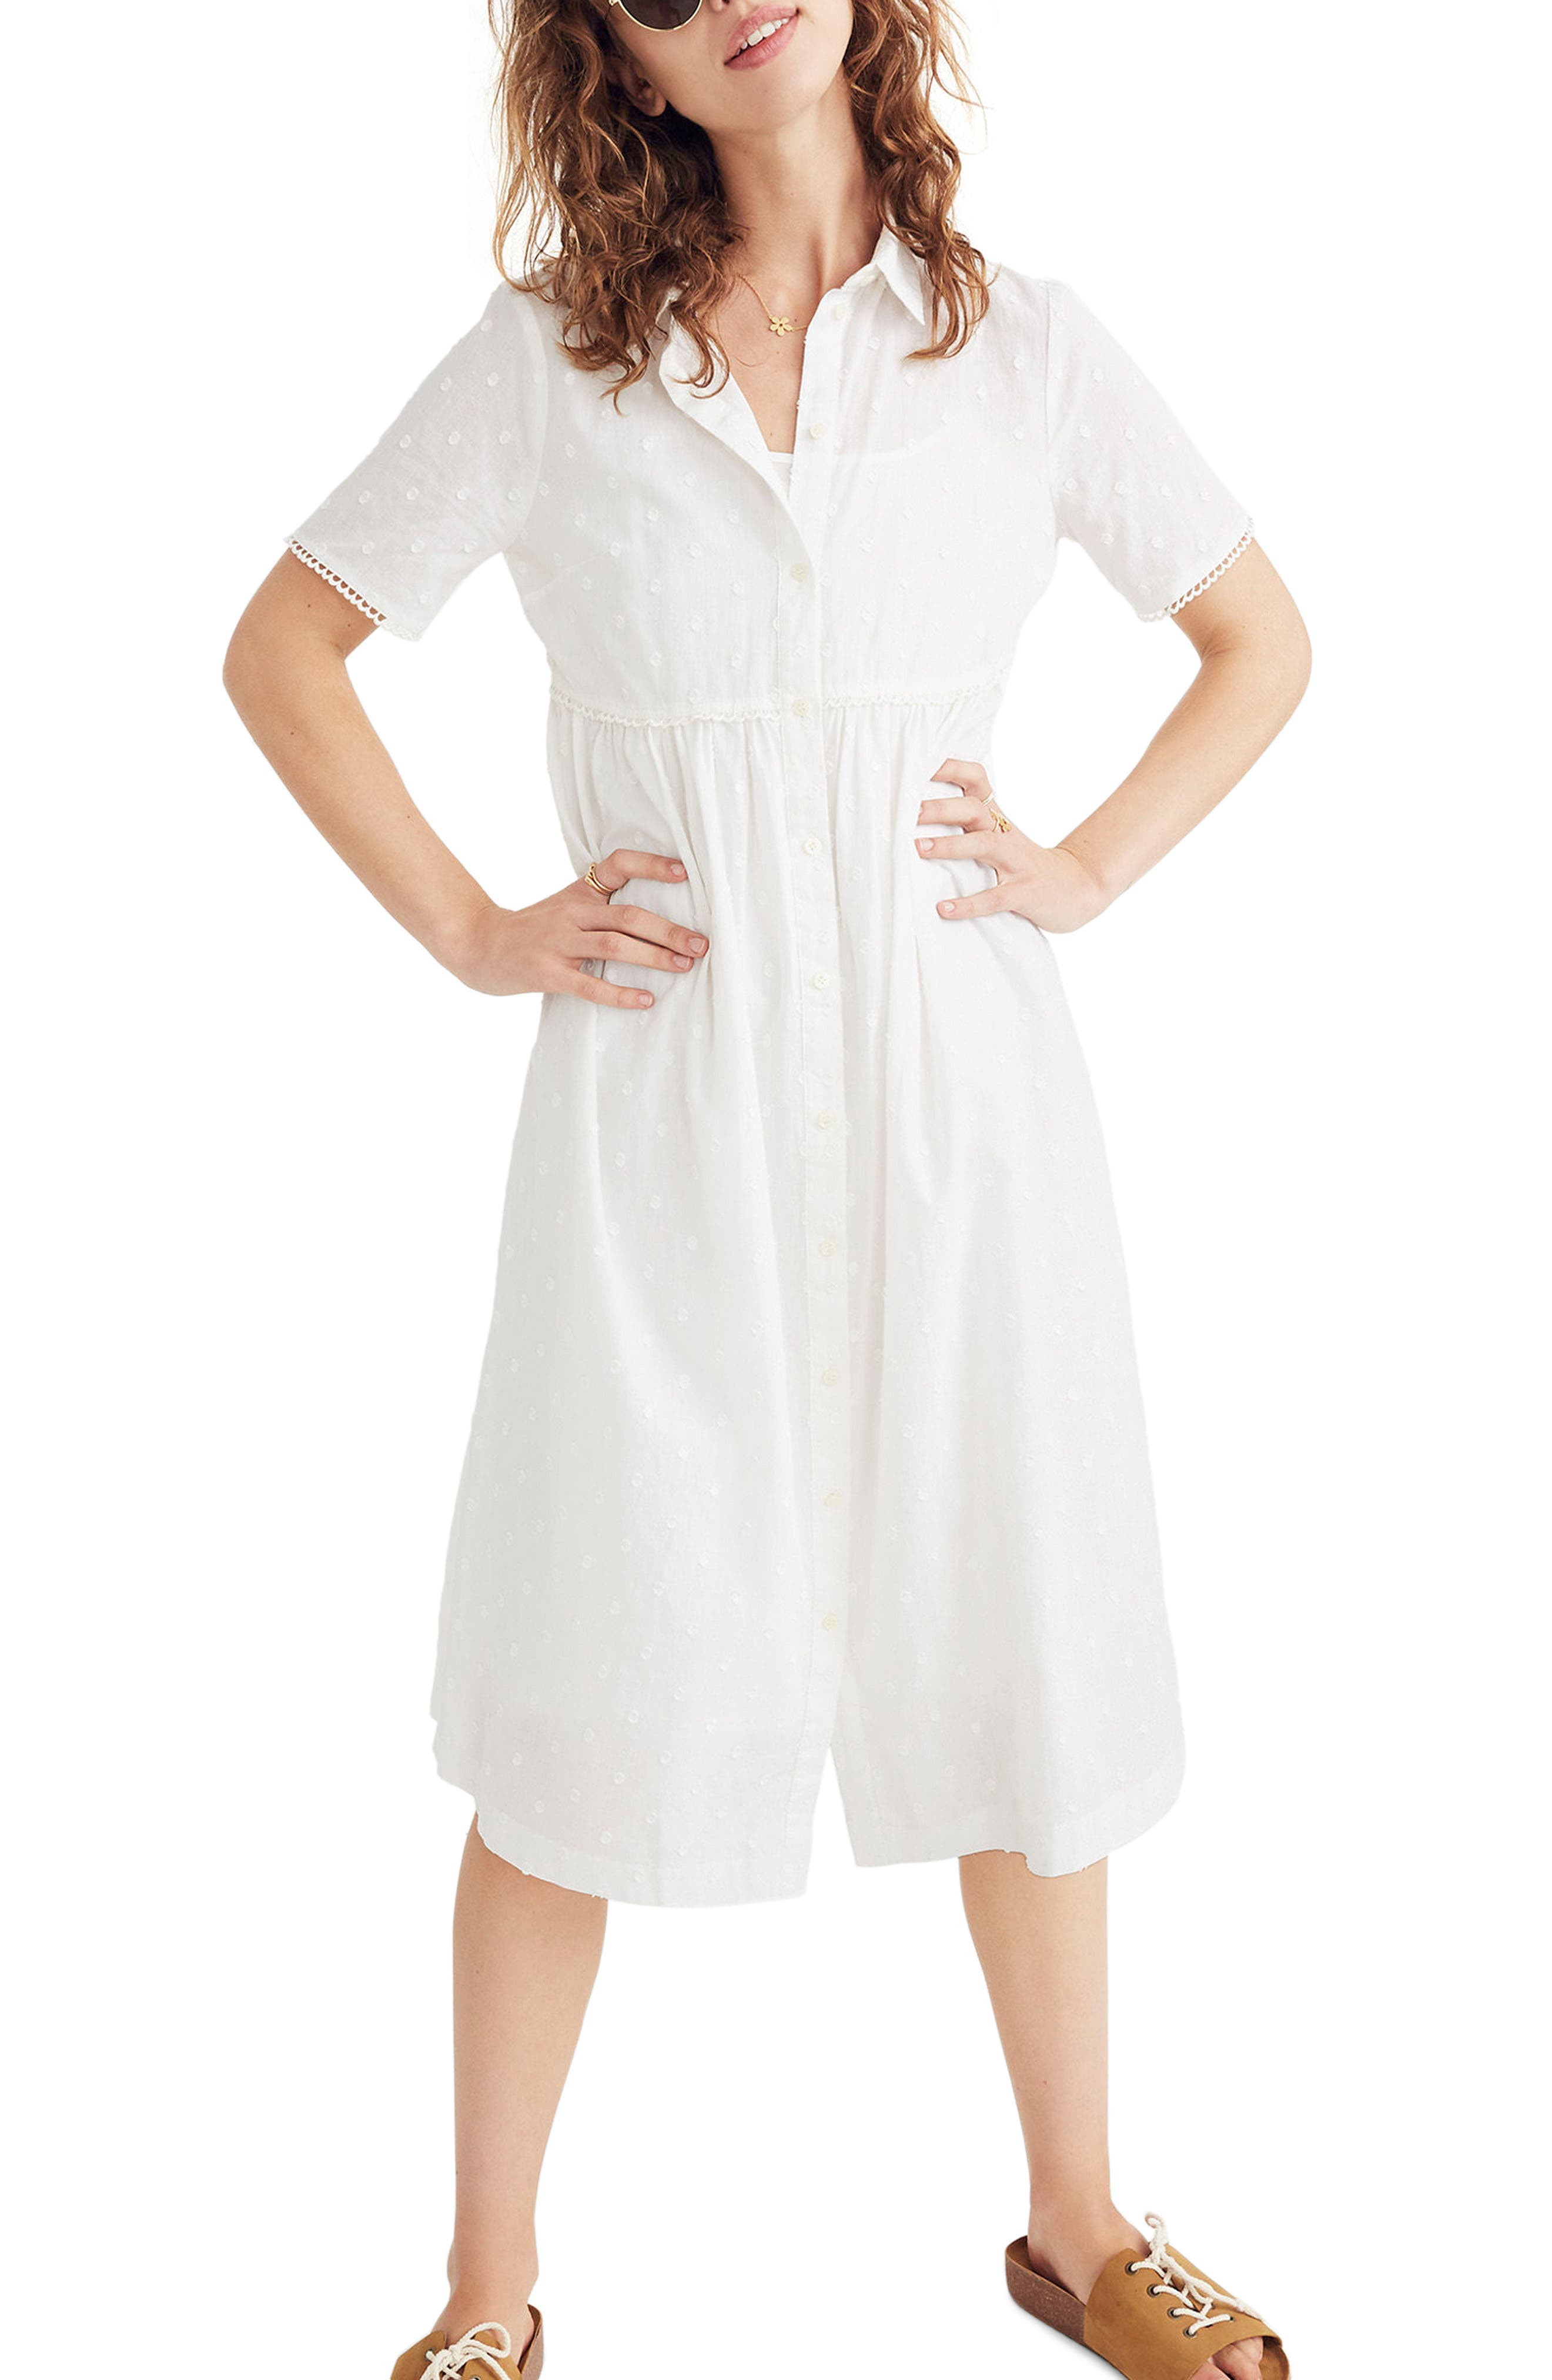 Clipdot Midi Shirtdress,                             Main thumbnail 1, color,                             EYELET WHITE